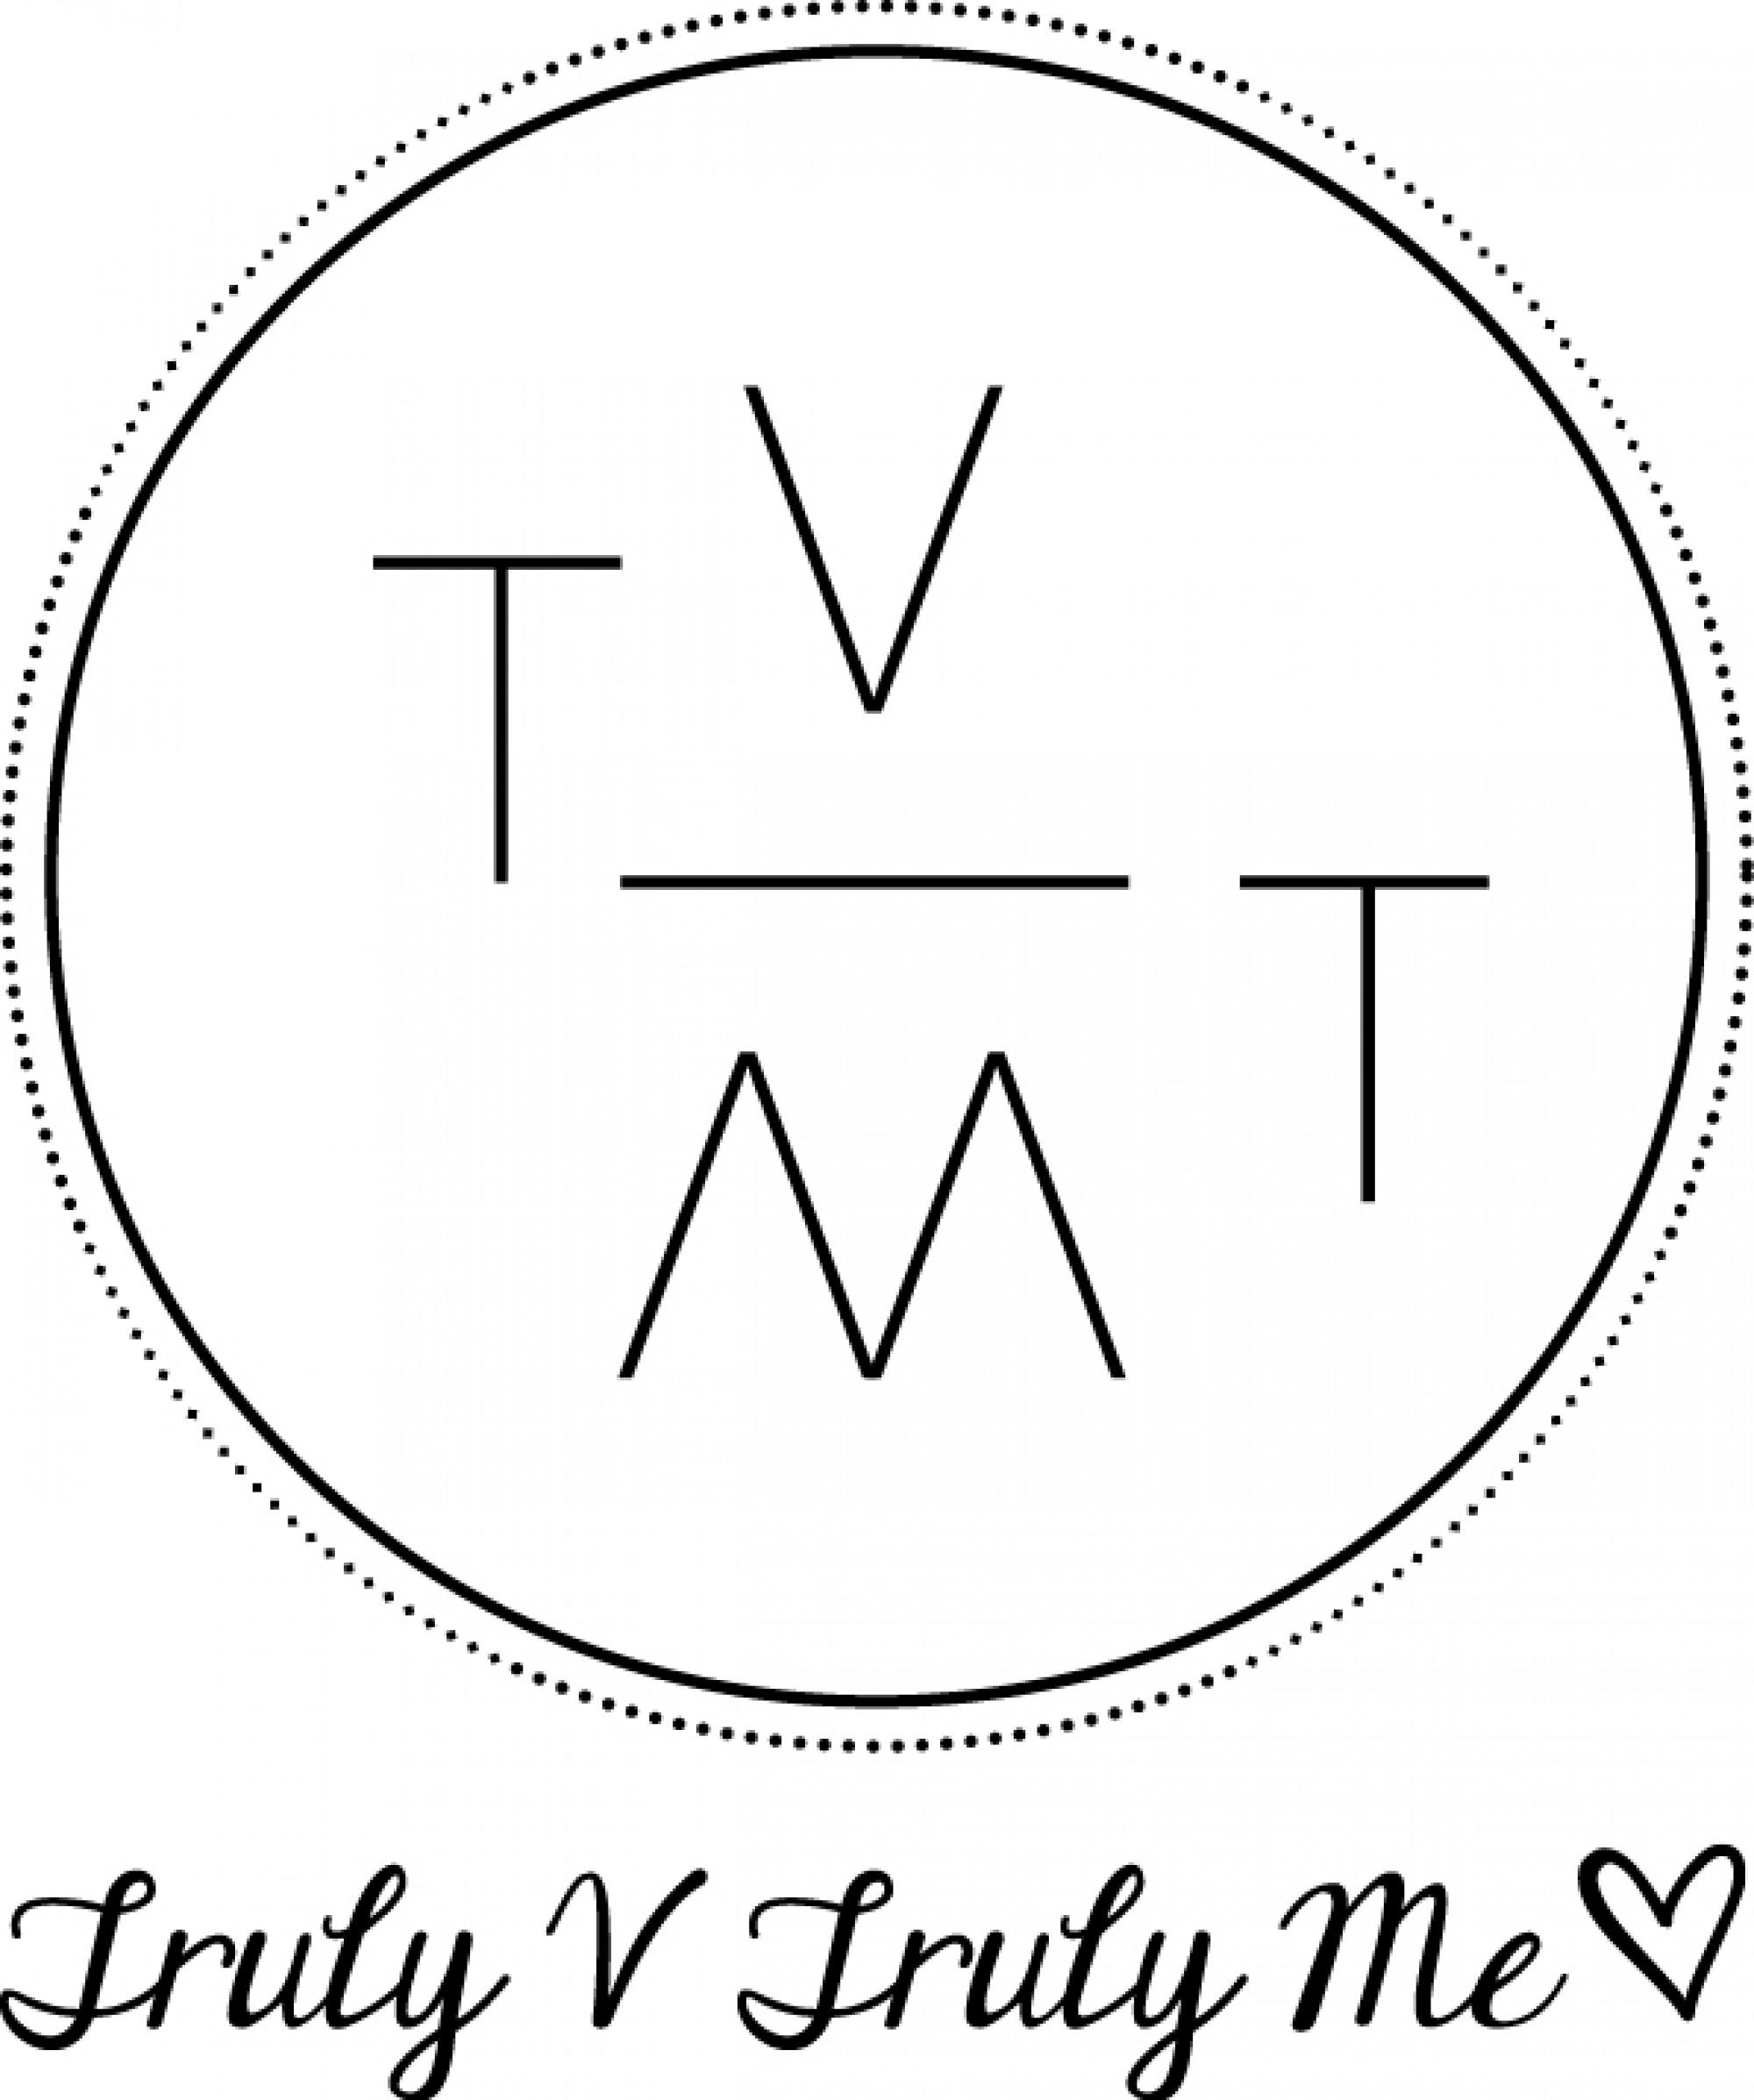 cropped-tvtm_logo.jpg